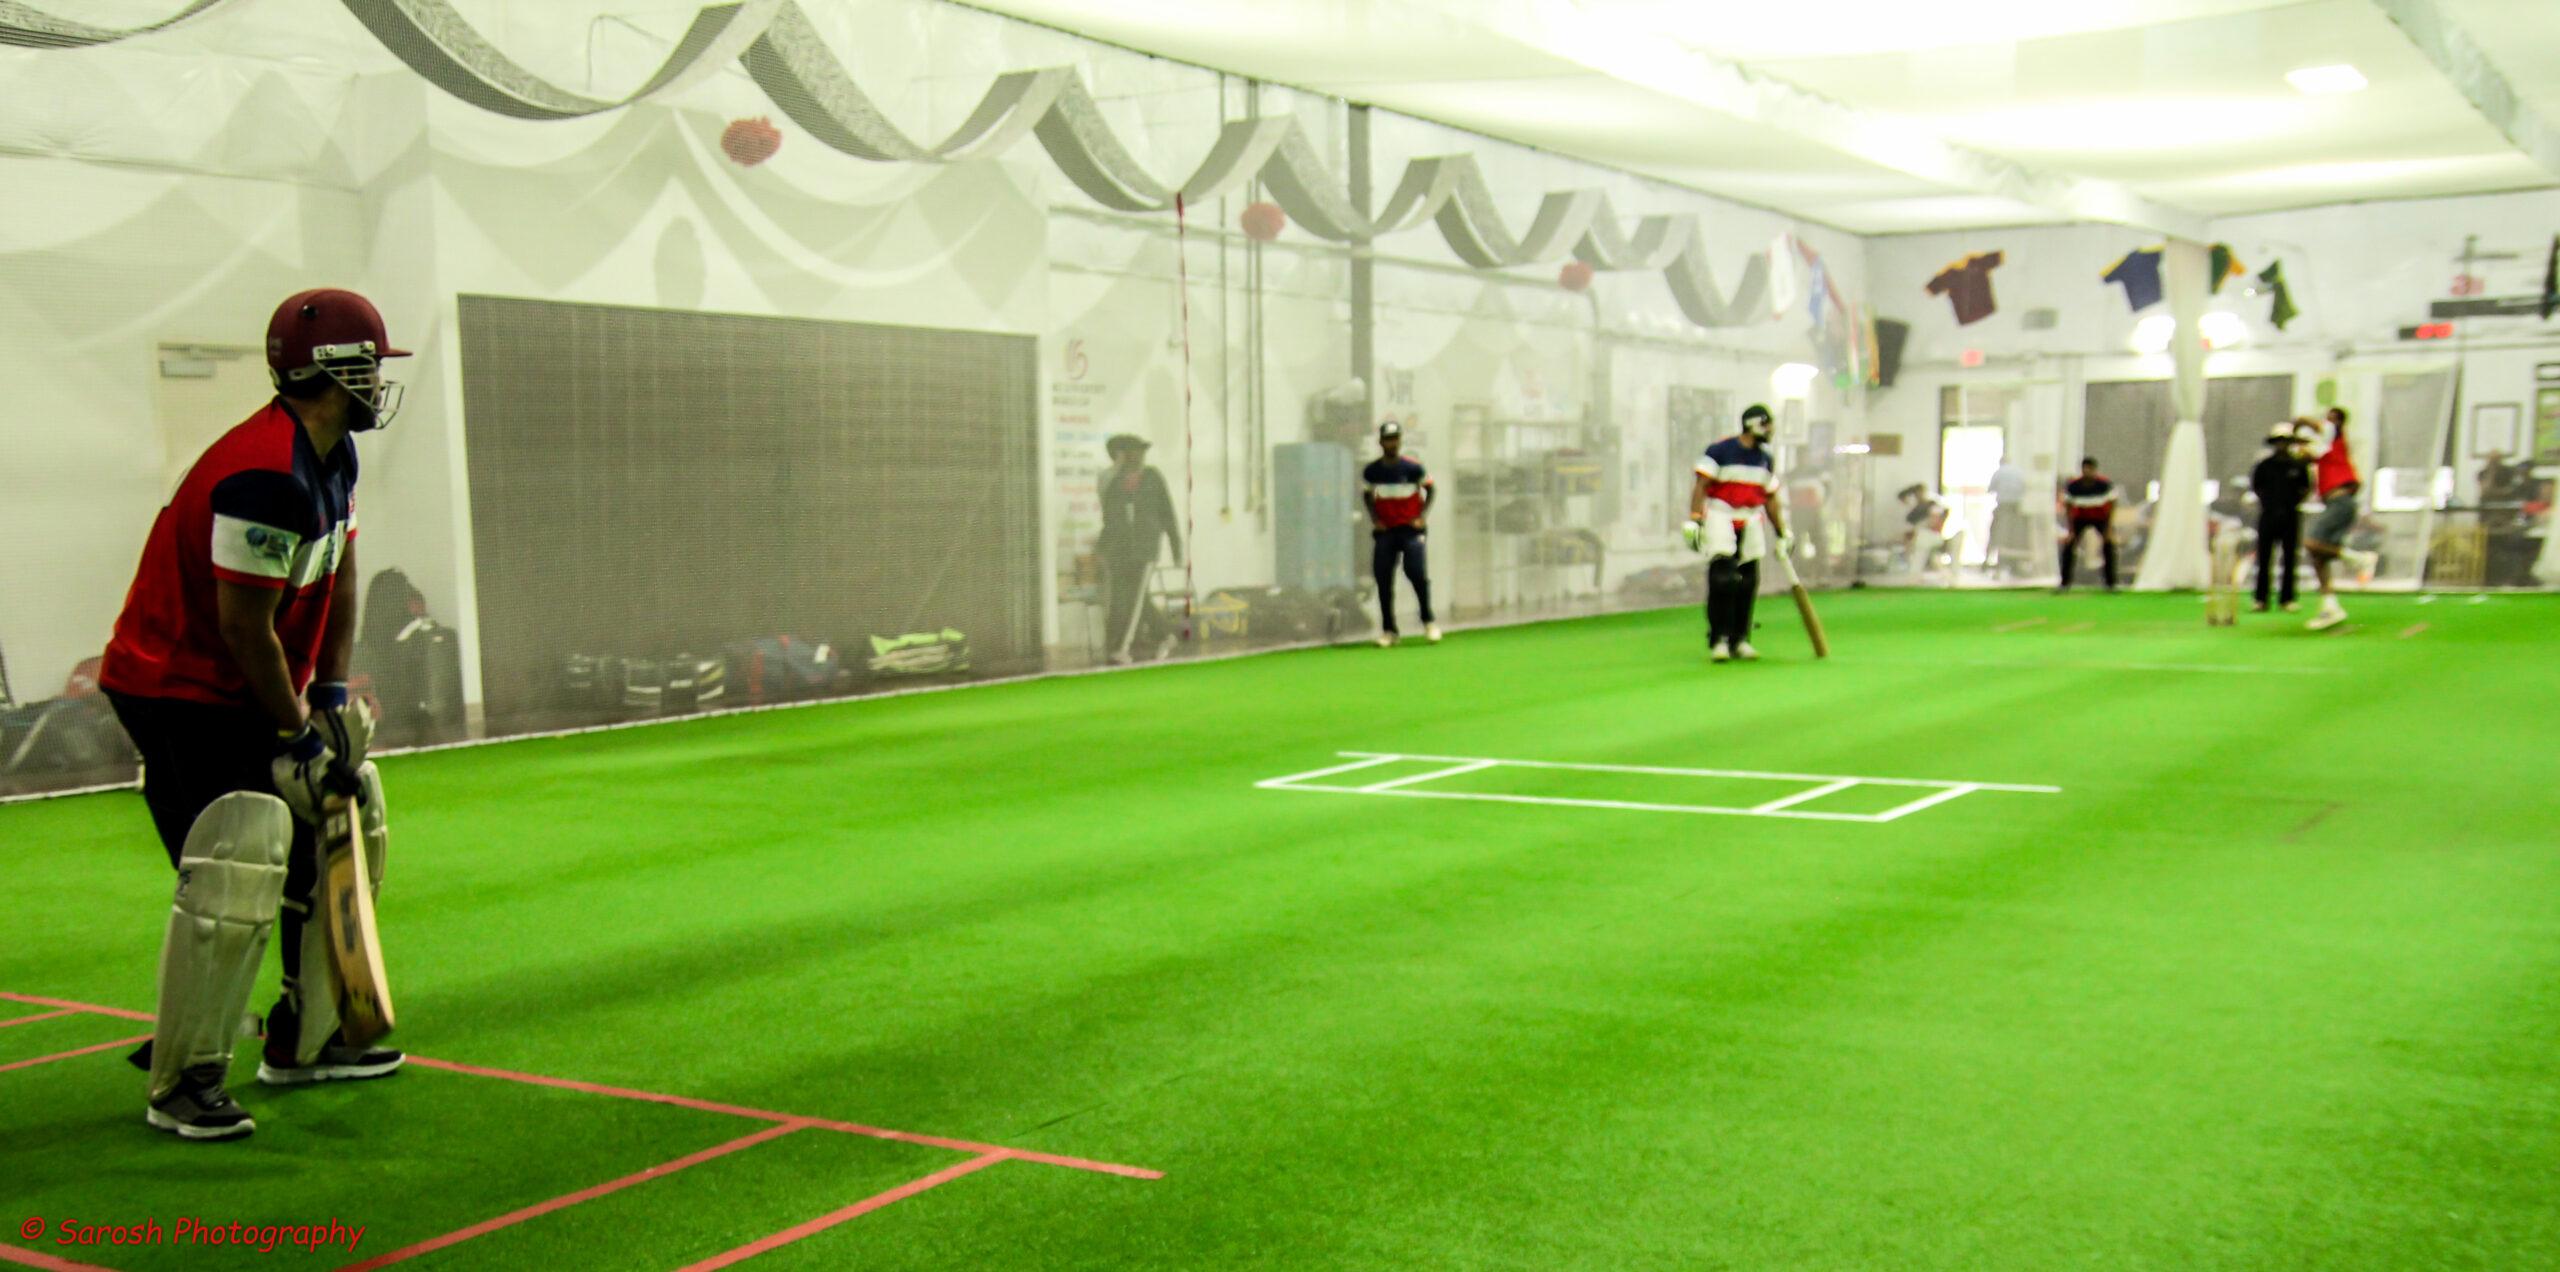 Wicket Club Gallery